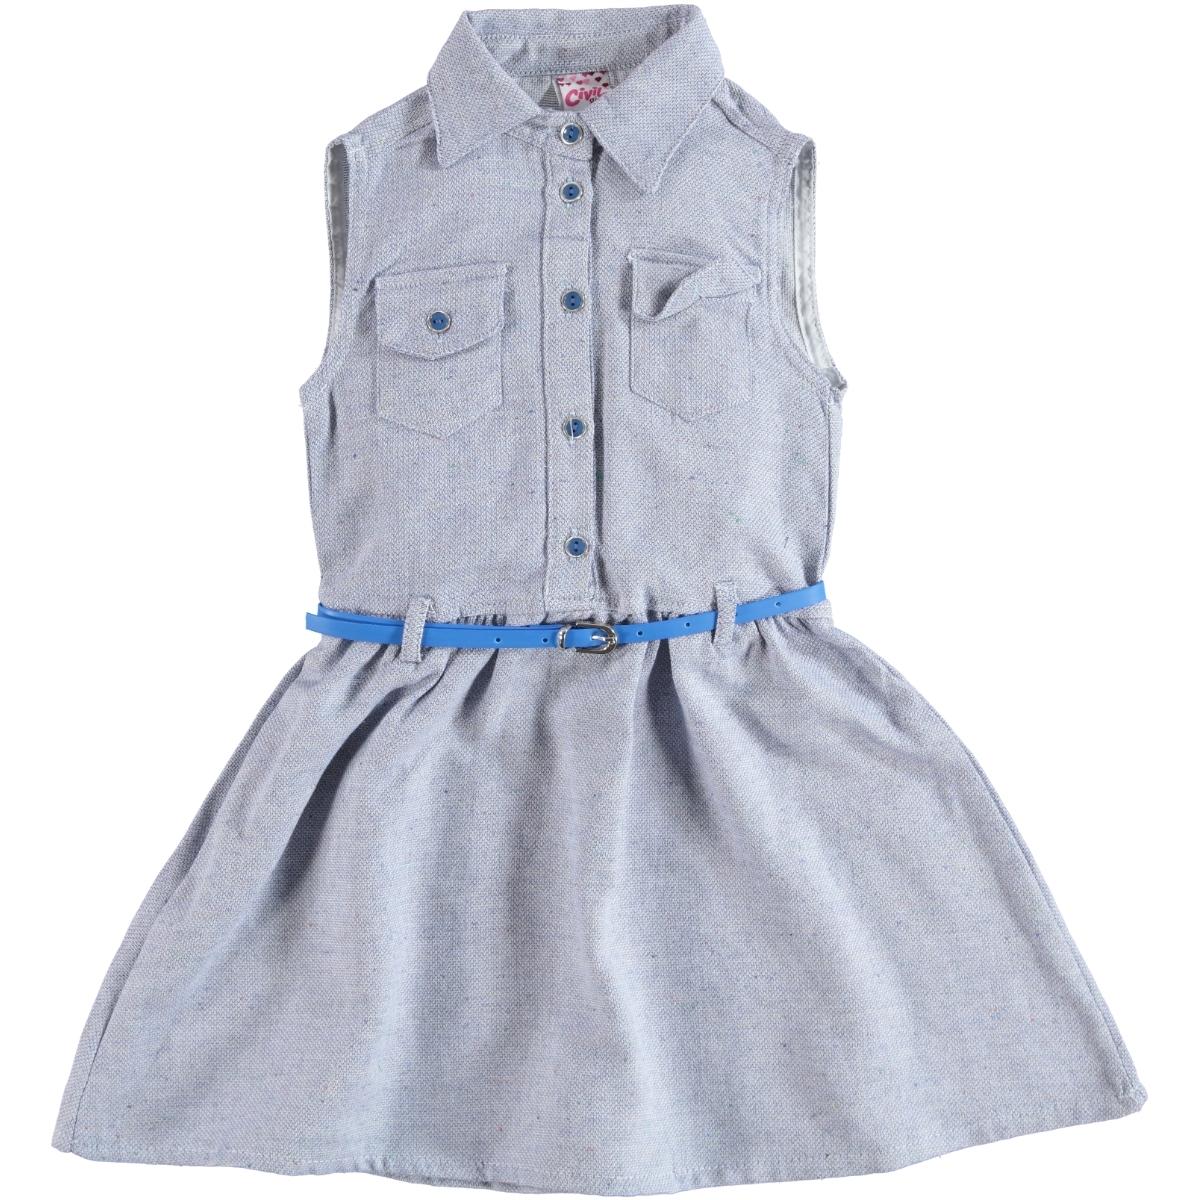 0a4f73c3185c7 Civil Girls 0142 / LCI Civil Girls Kız Çocuk Elbise 10-13 Yaş Lacivert